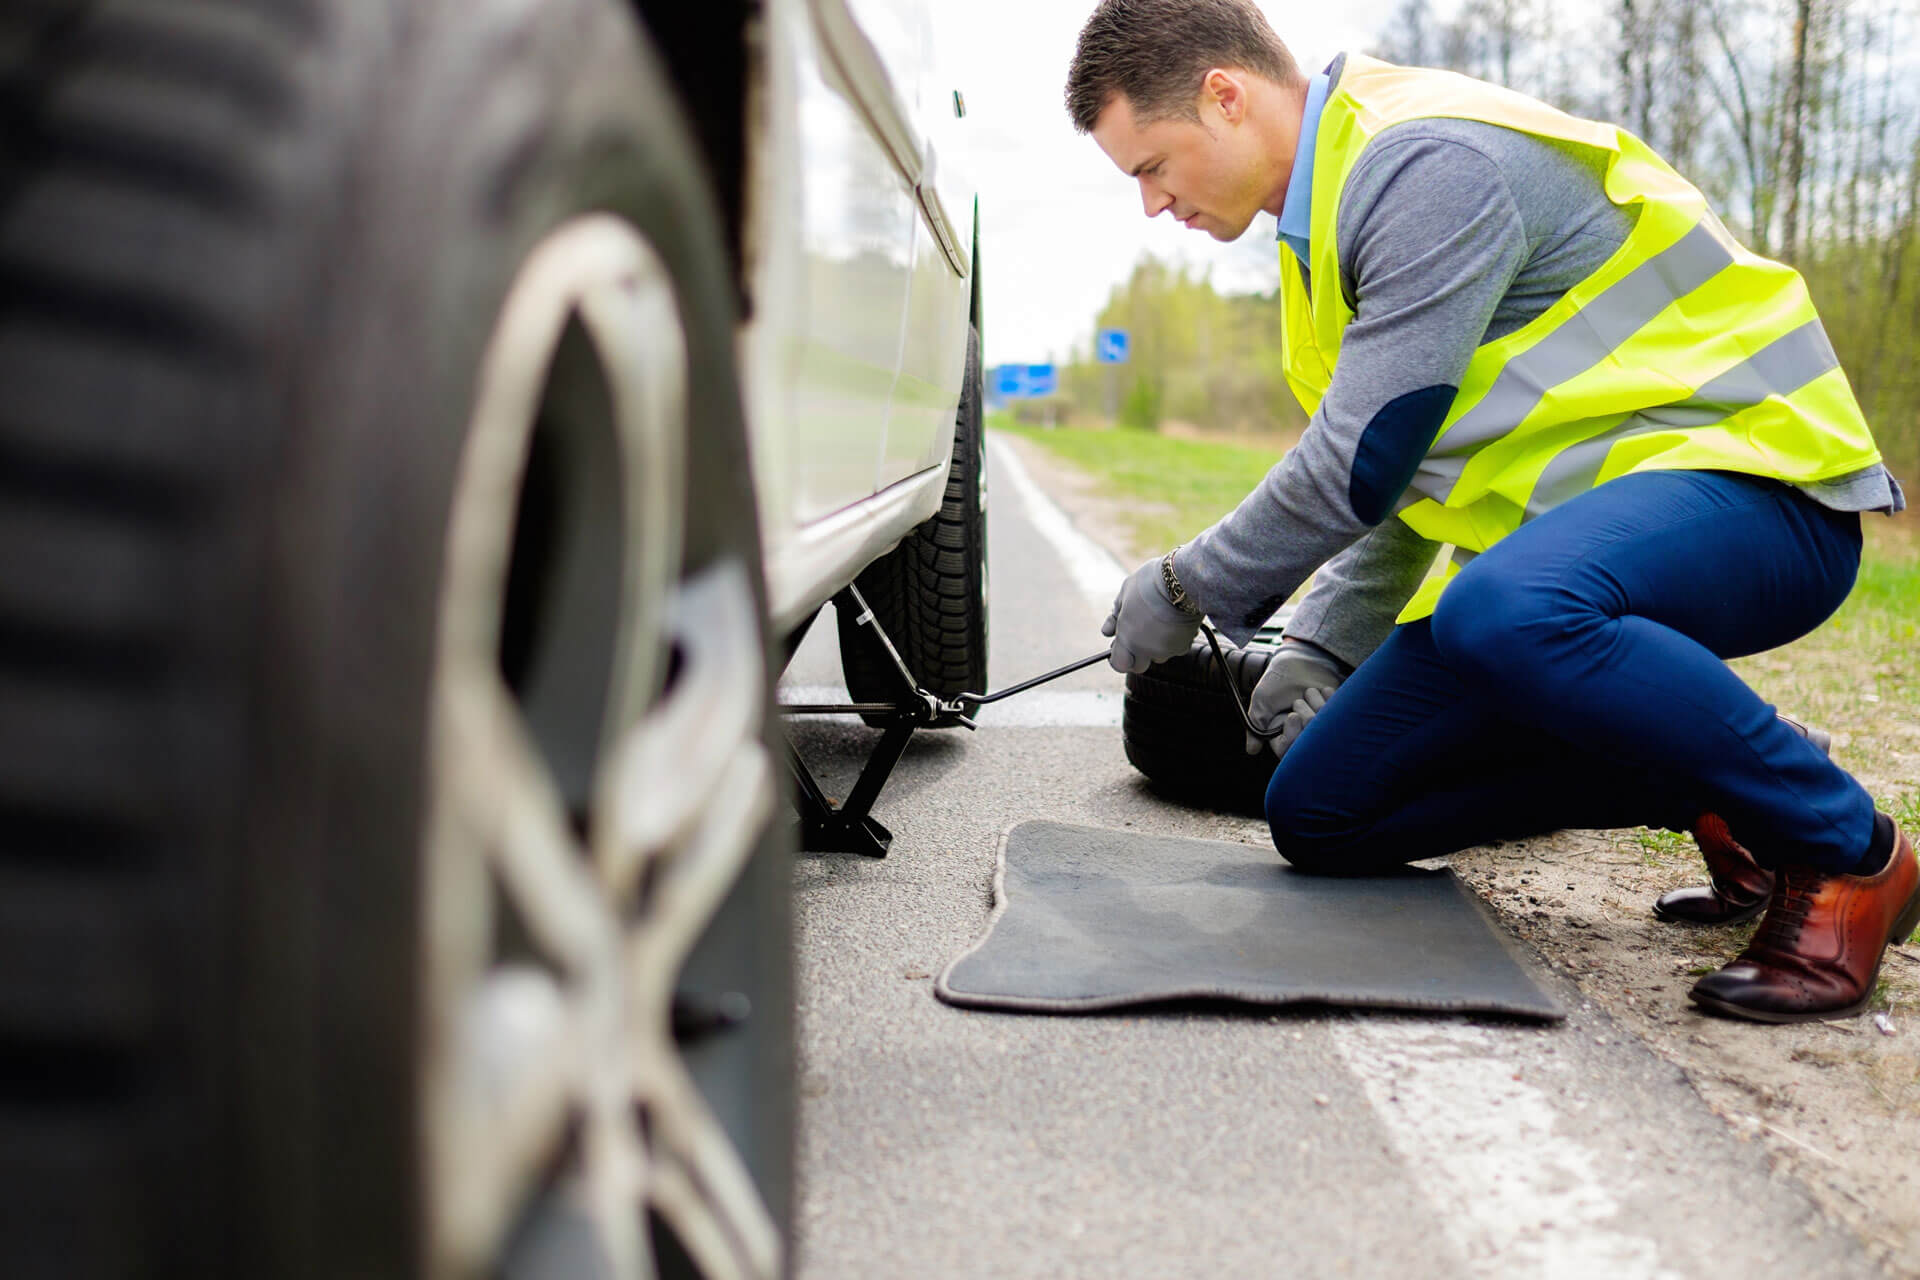 Tire Repair & Change Emergency Service 24 7 365